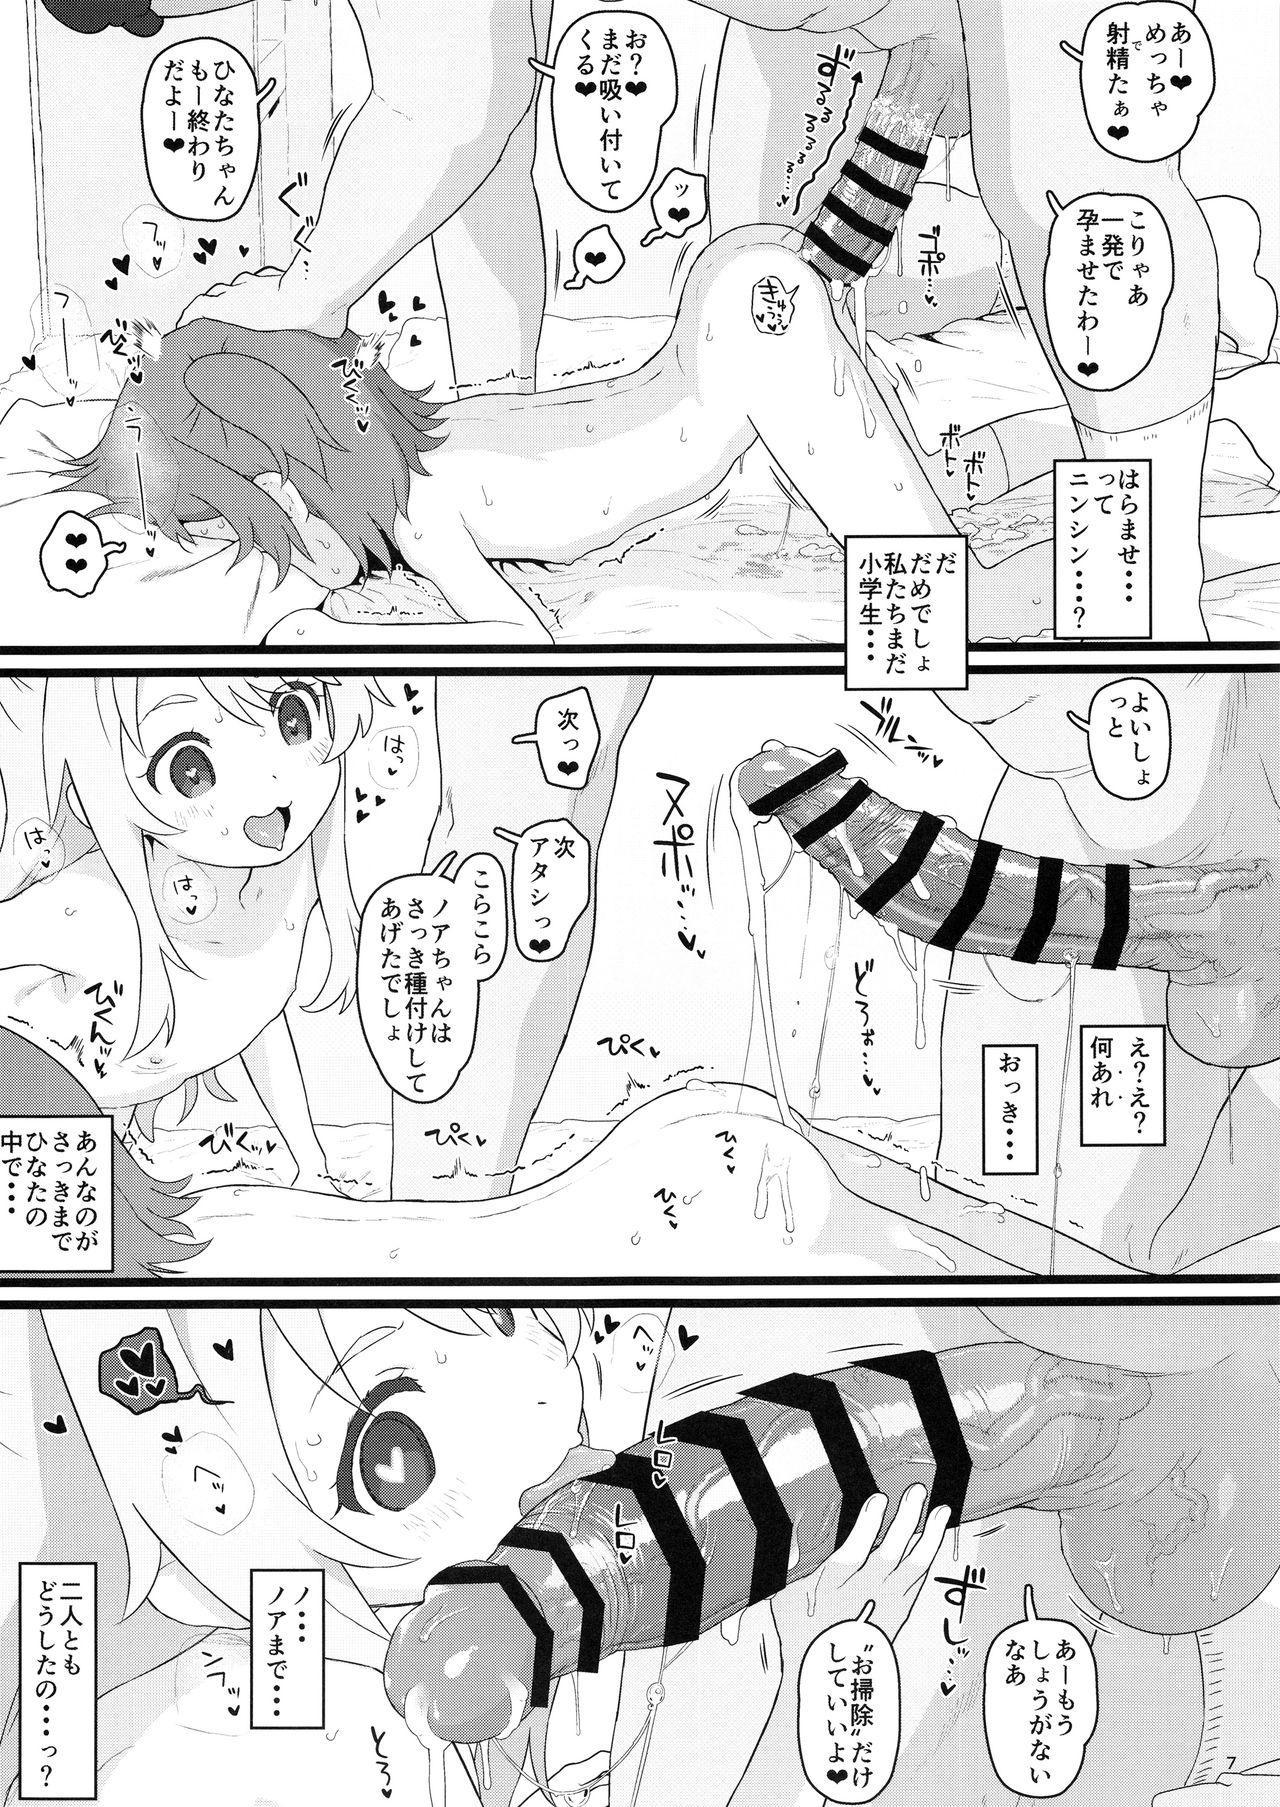 Kyou no Onaho 6